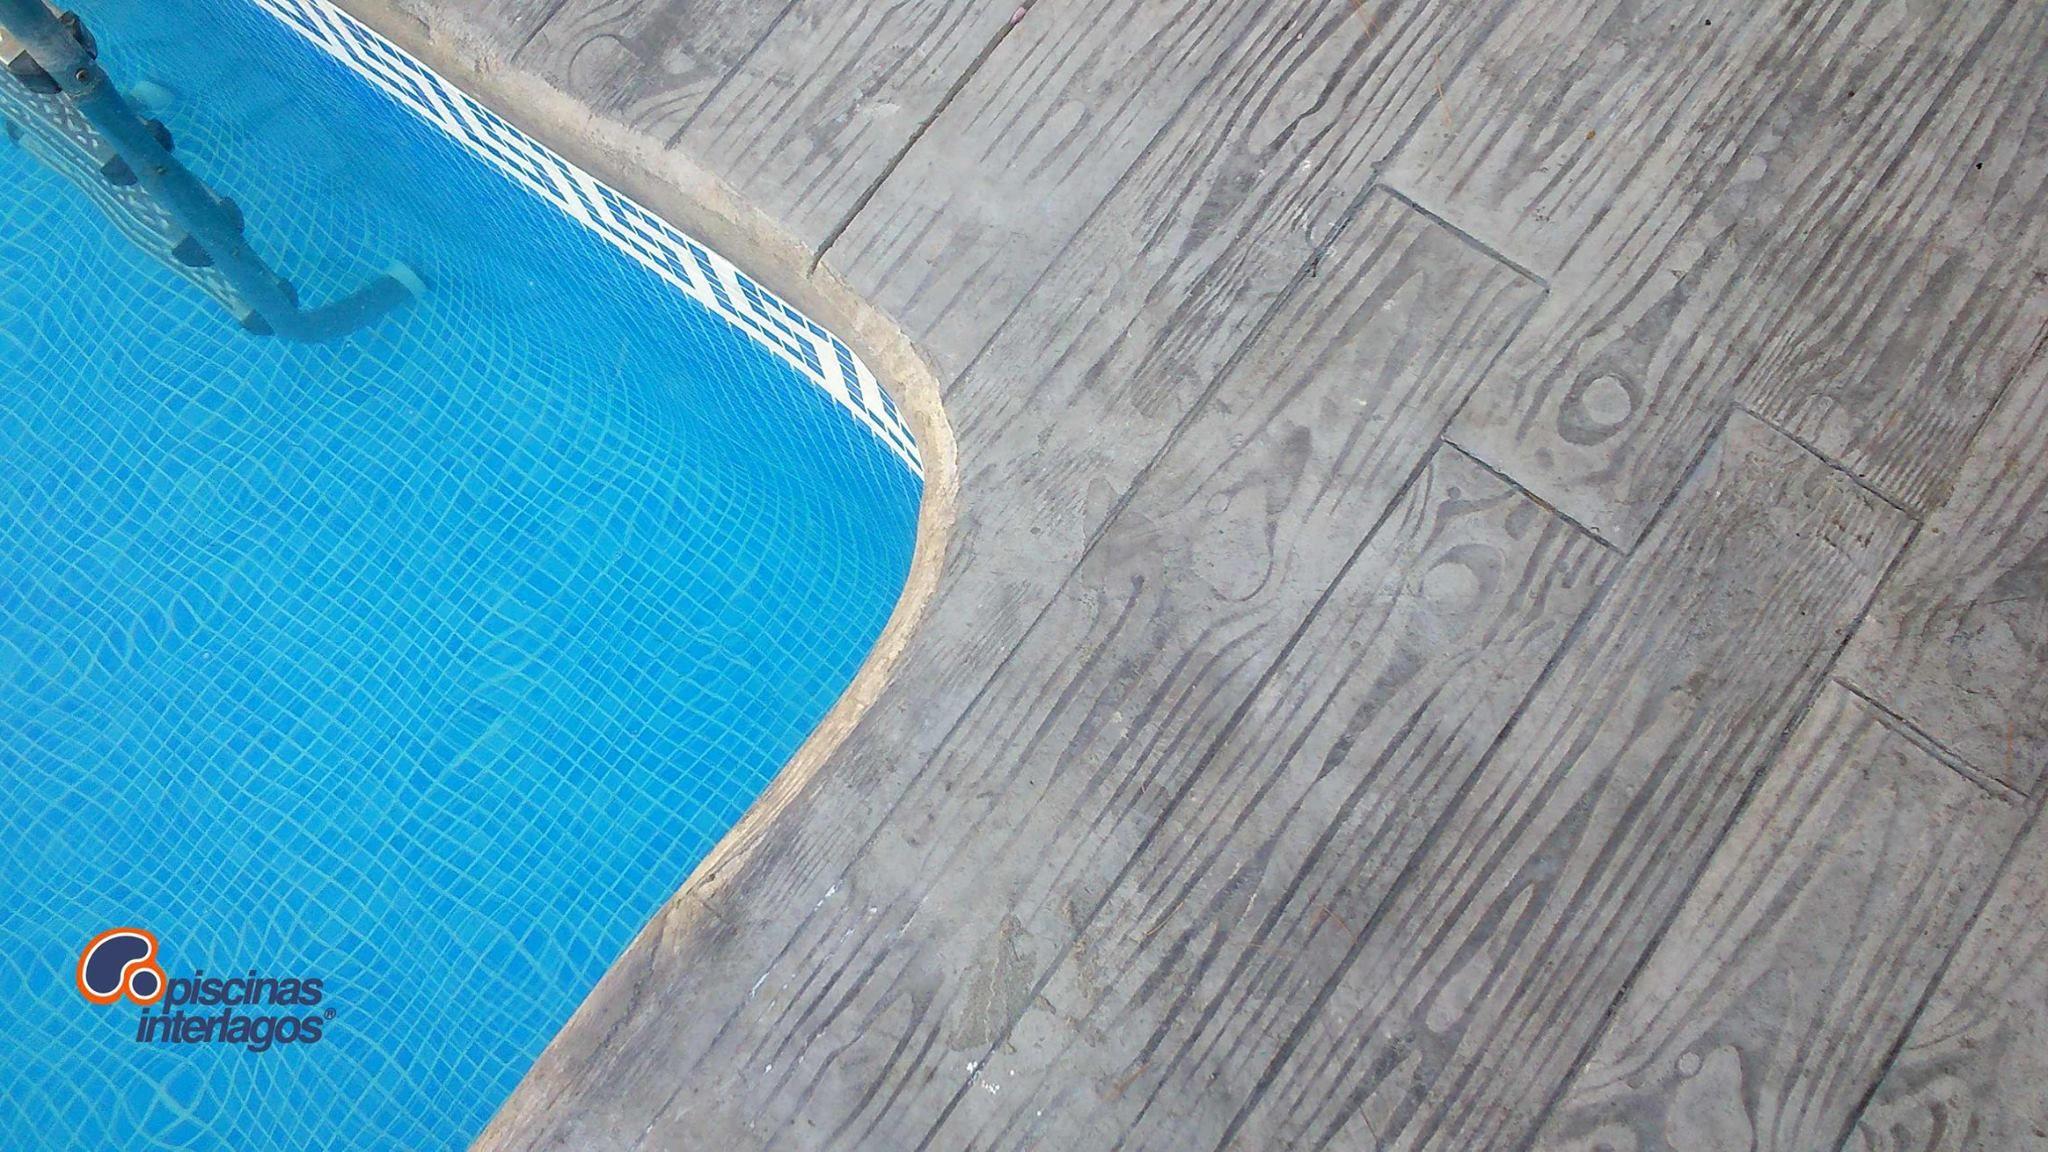 Detalle de madera impresa en el borde de la piscina en for Piscina benicassim